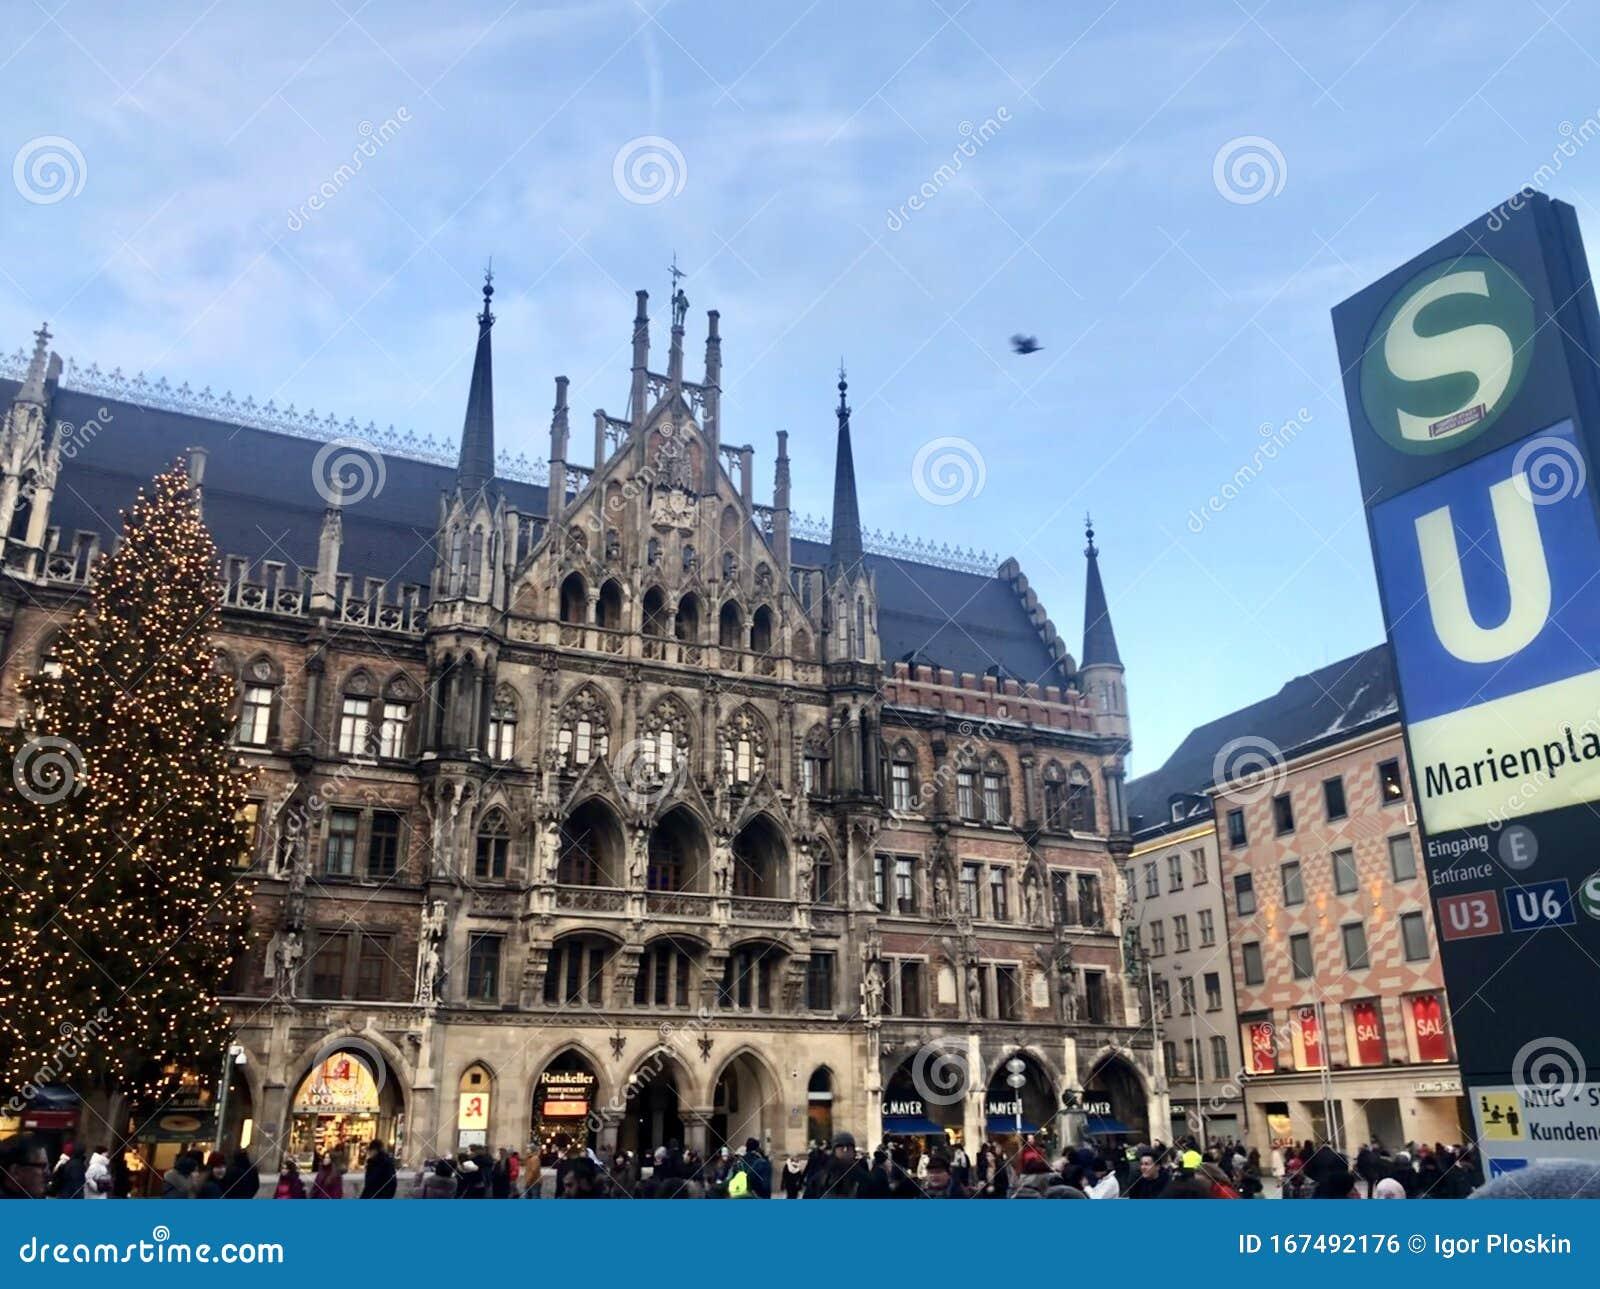 Christmas City Of Munich Editorial Photo Image Of Europe 167492176